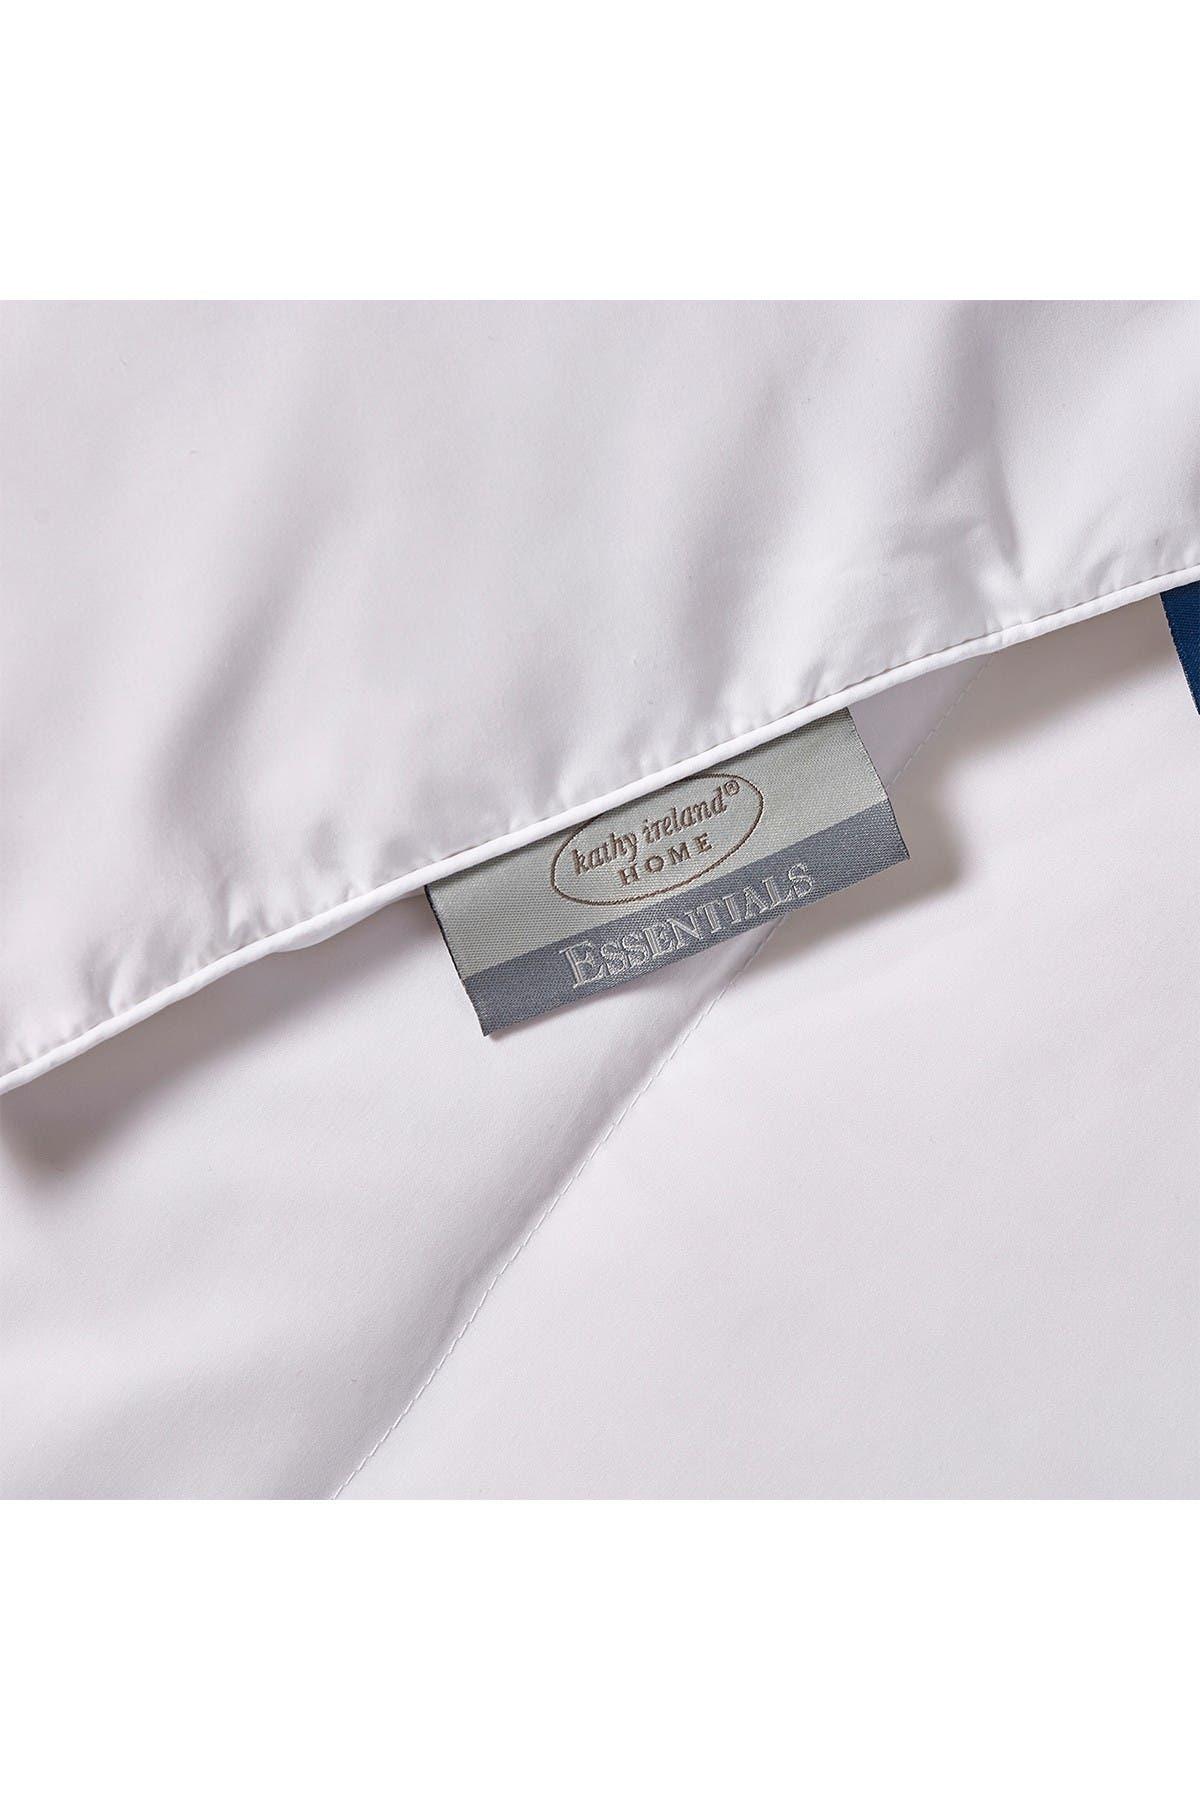 Image of Blue Ridge Home Fashions Kathy Ireland All Season White Down Fiber Comforter - Full/Queen